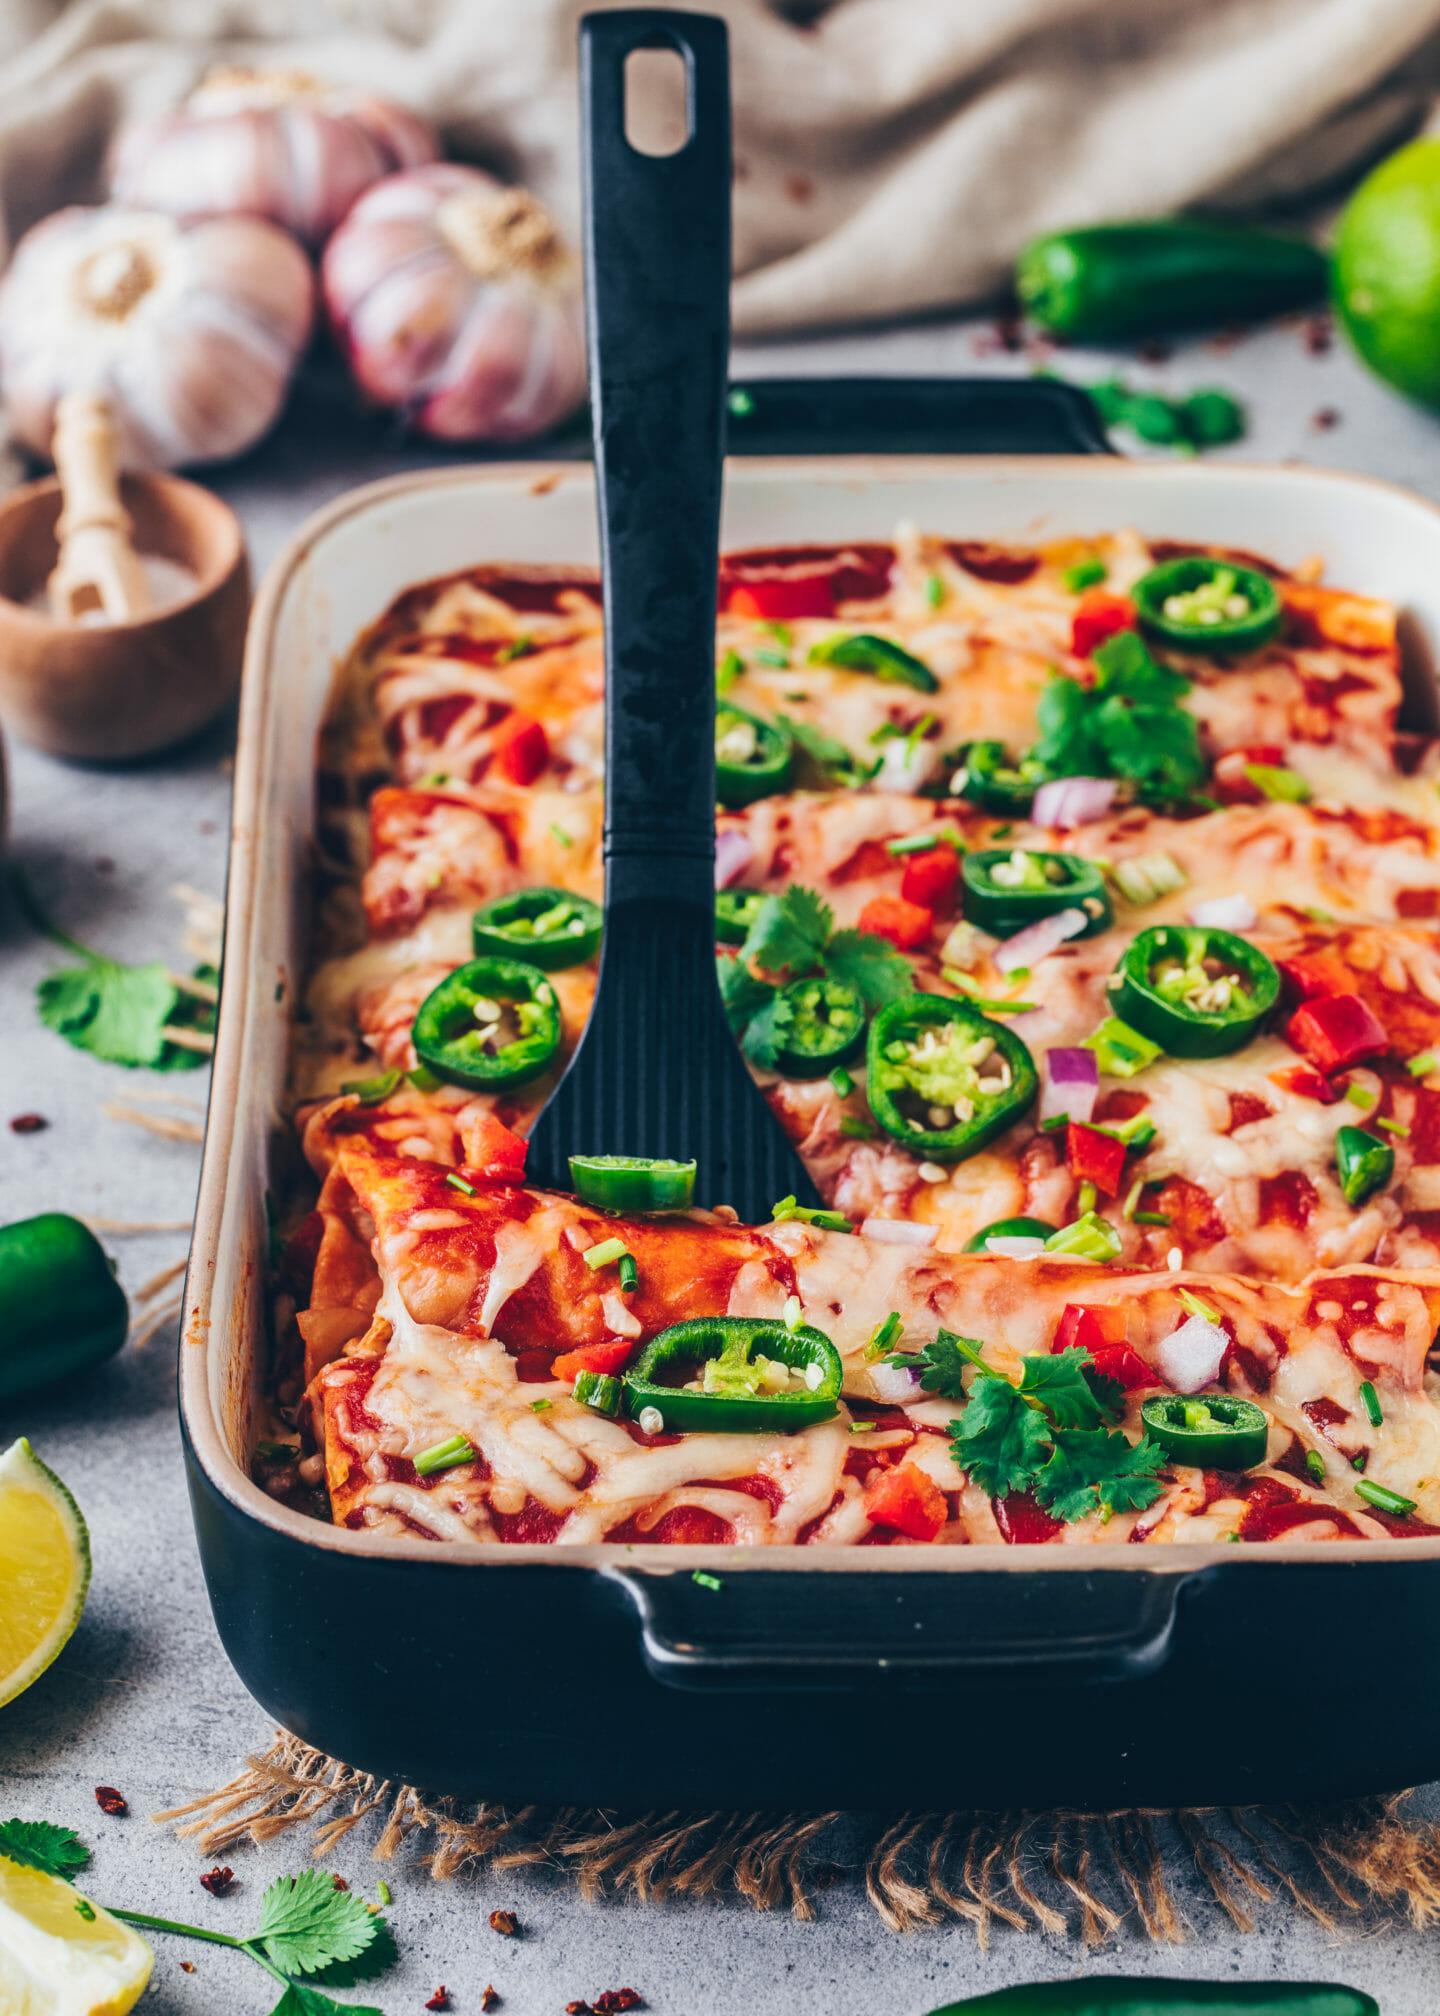 Vegan Enchiladas with Beans (Mexican Veggie Casserole)